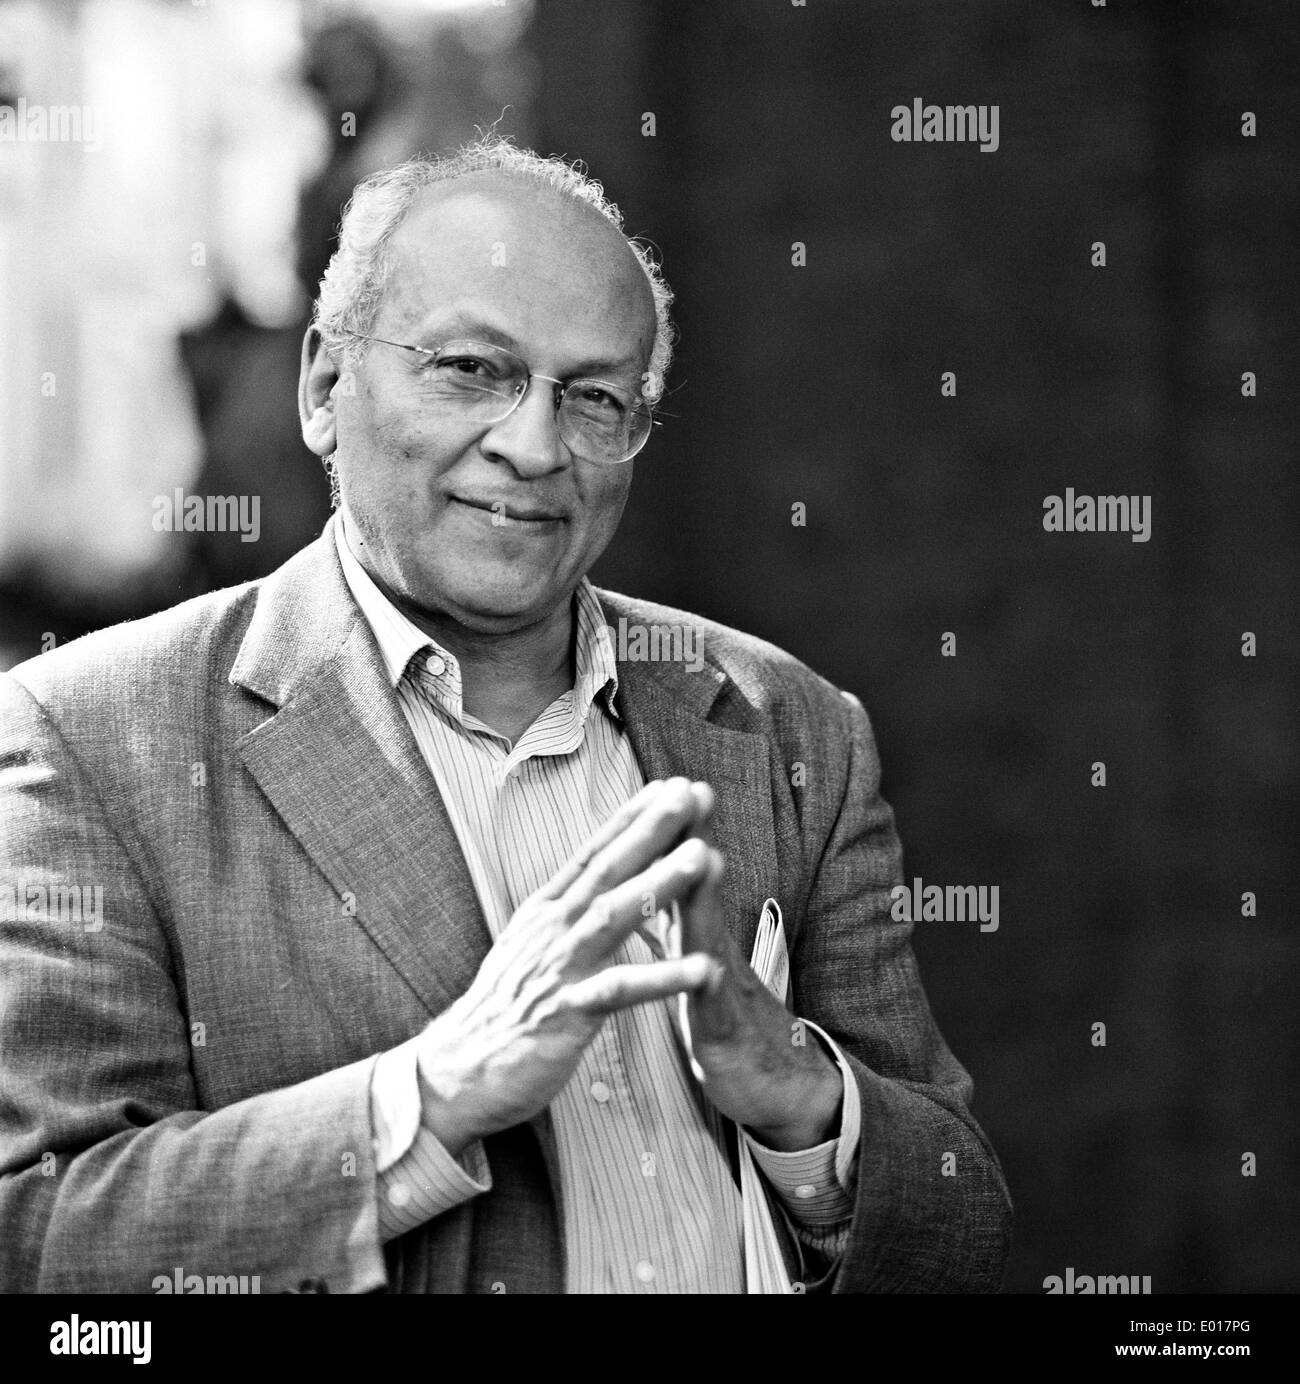 Gamal Al-Ghitani, 2006 - Stock Image